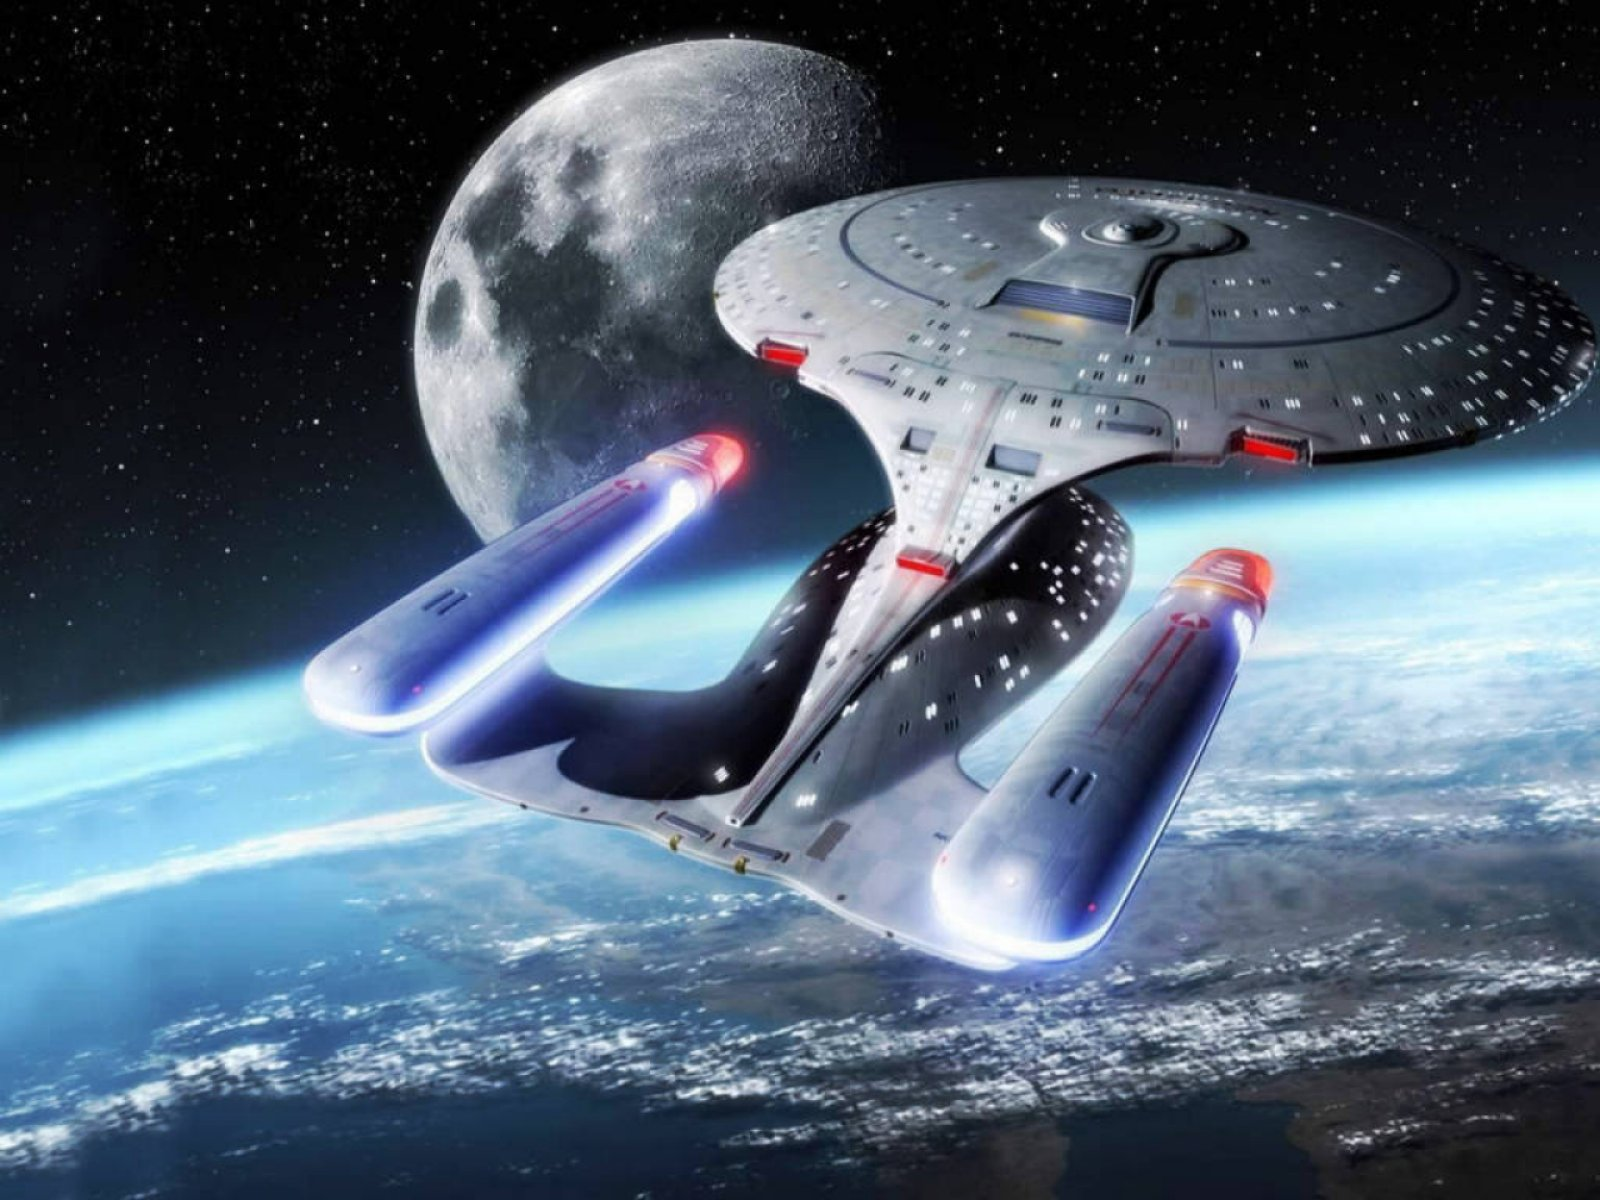 Star Trek Ship Wallpapers: DJ Cronin: Advocating For Volunteerism: June 2011